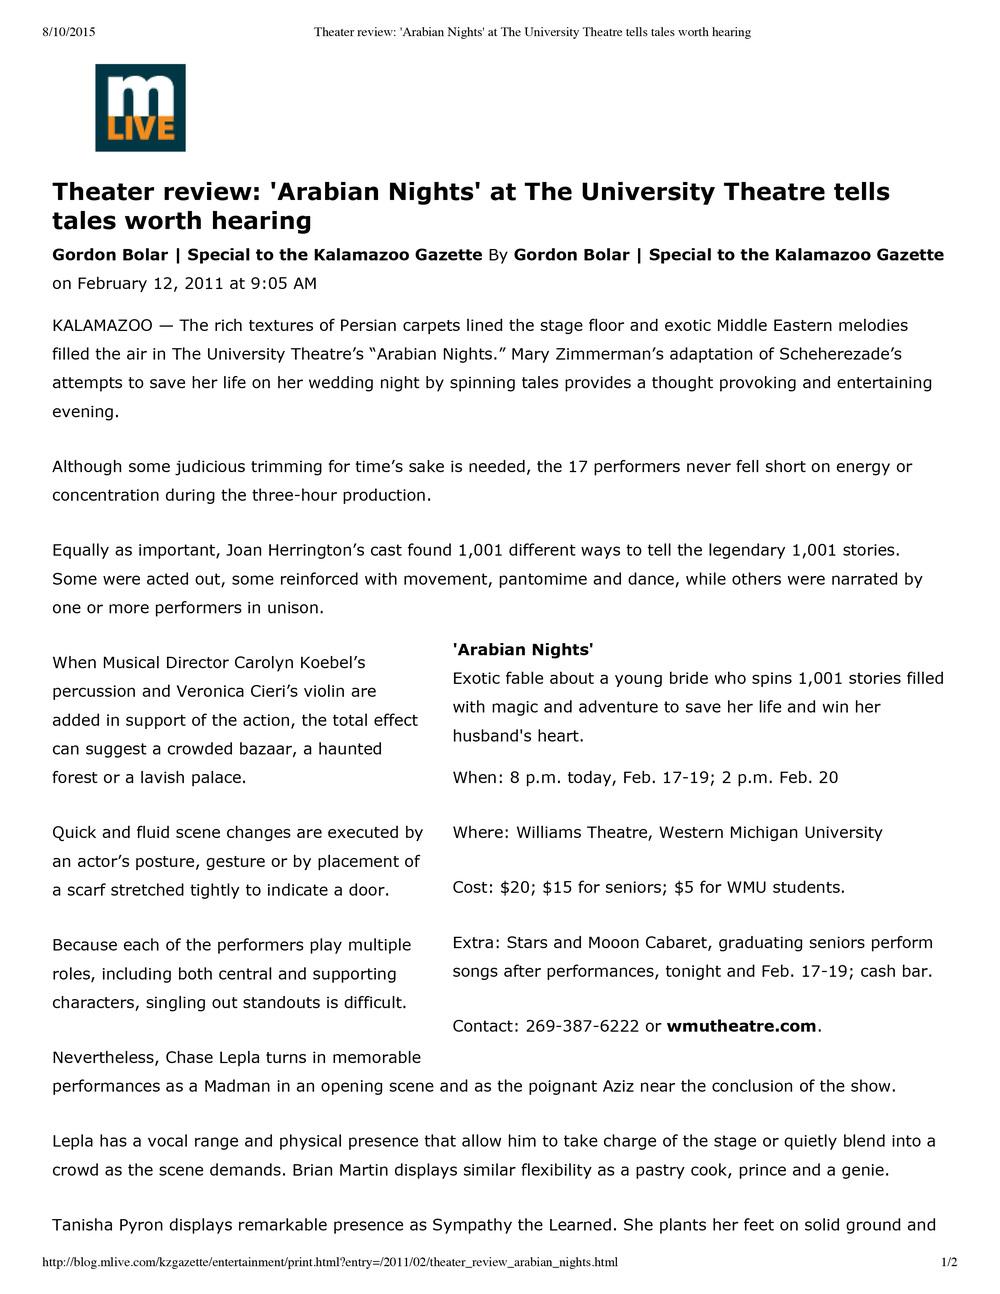 Theater review_ 'Arabian Nights' at The University Theatre tells tales worth hearing.pdf-1.jpg